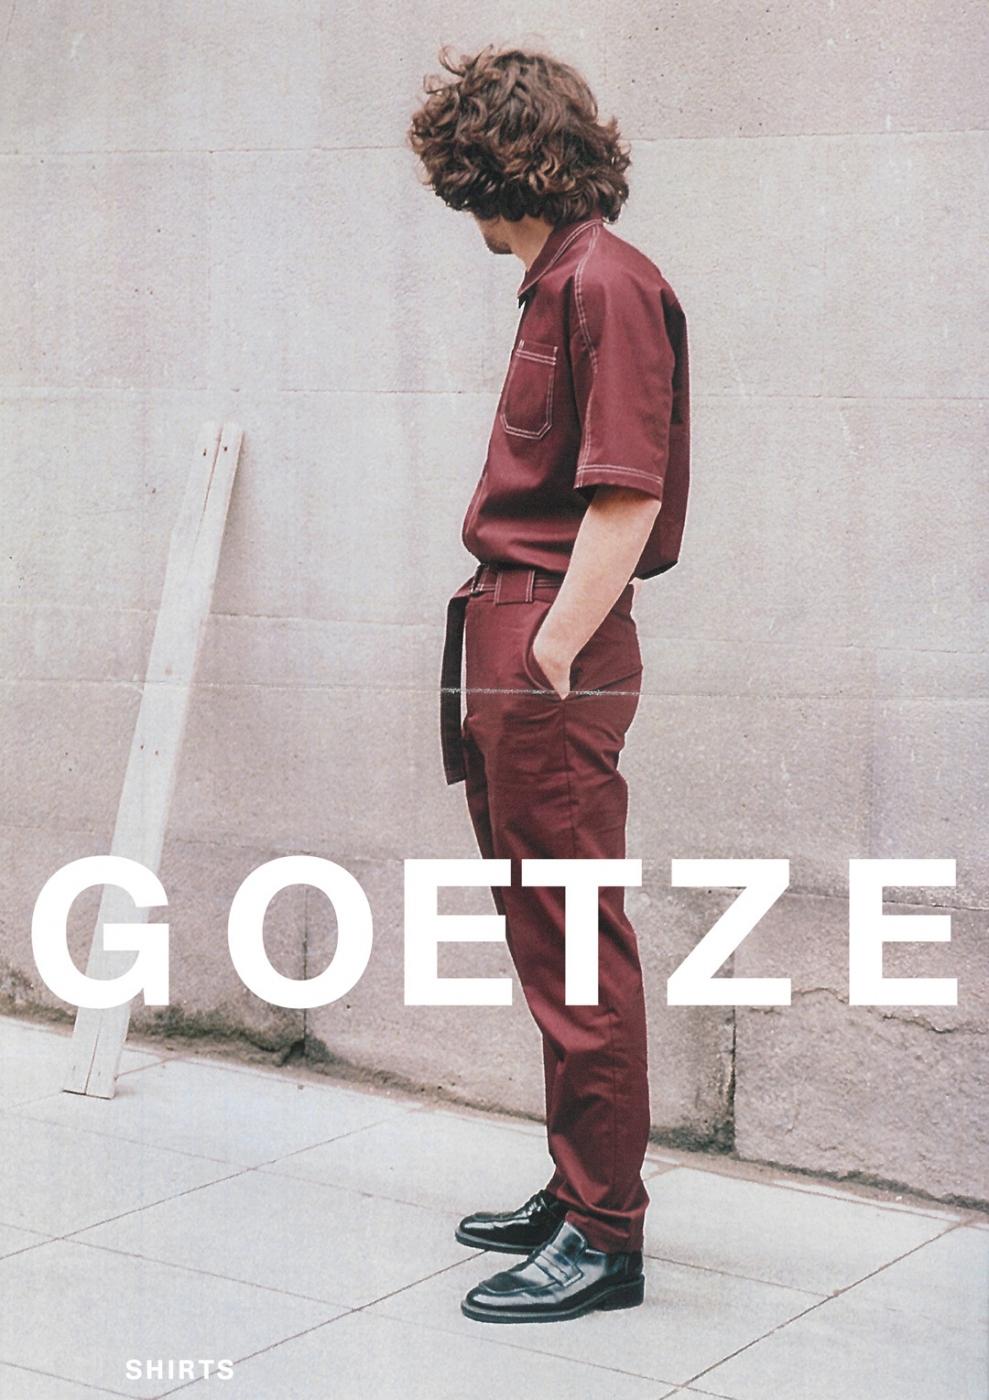 GOETZE_SS2018_DAVIT GIORGADZE_ CHRISTIAN STEMMLER_6